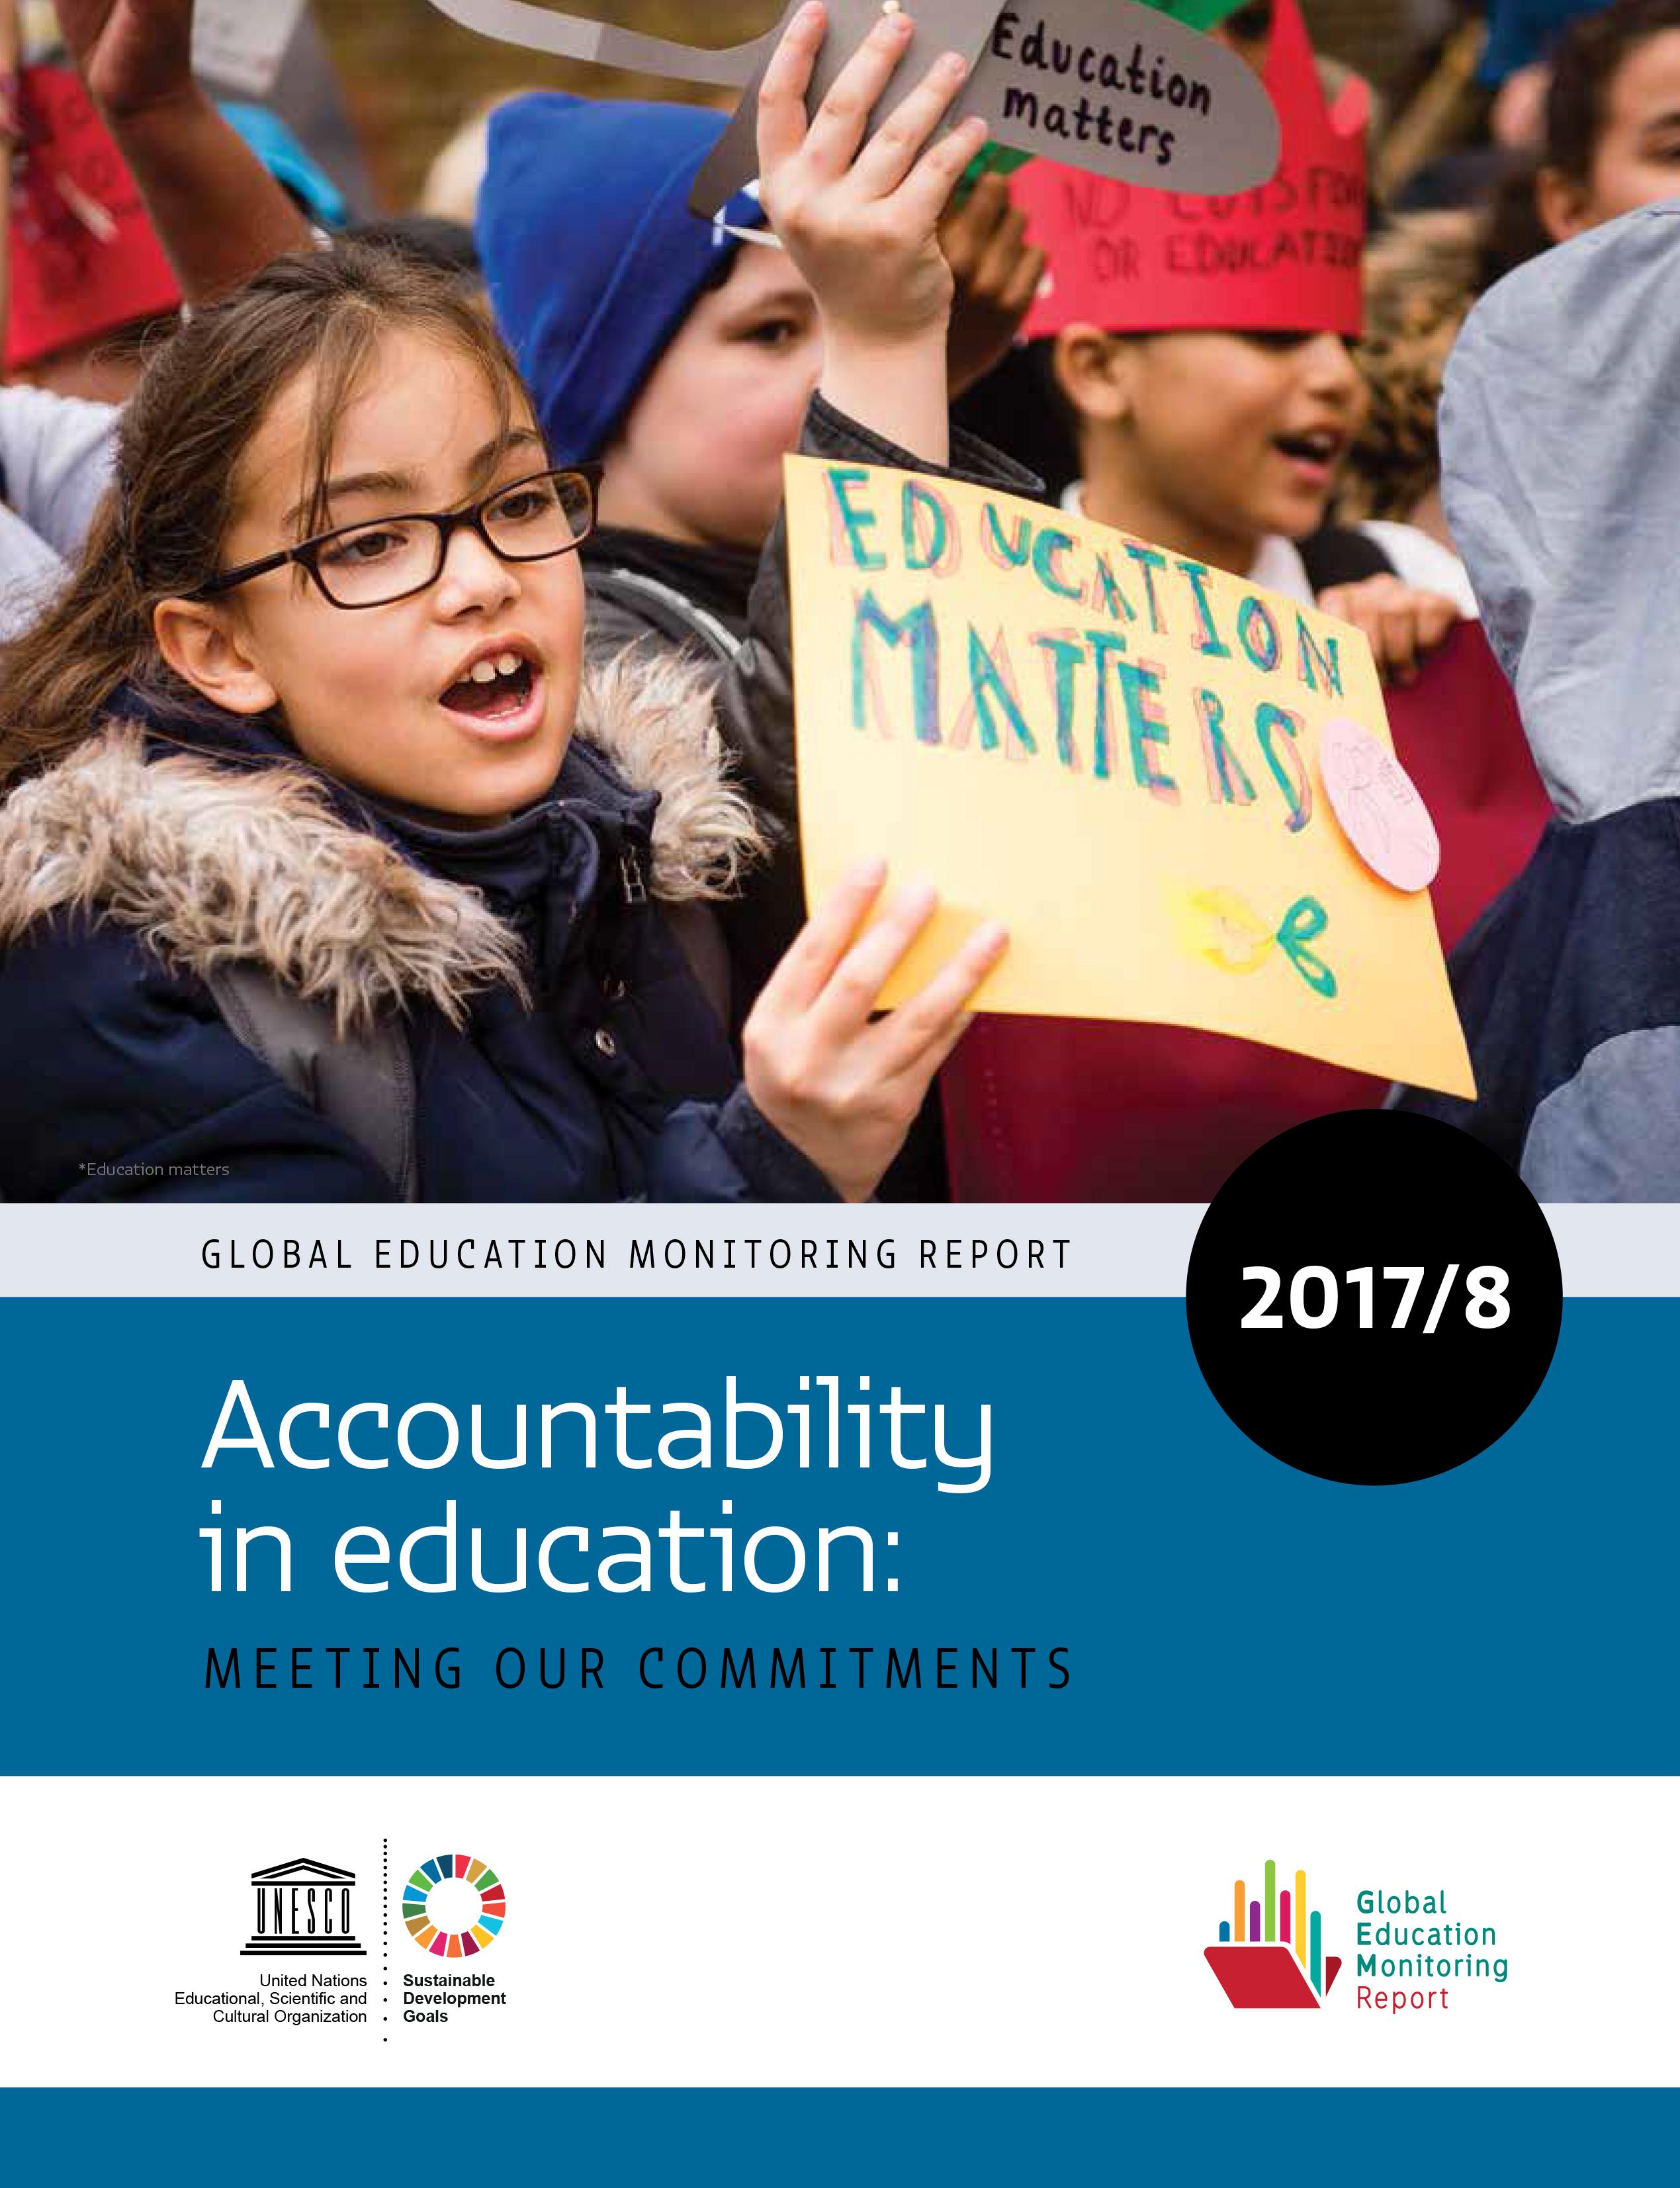 accountability in education